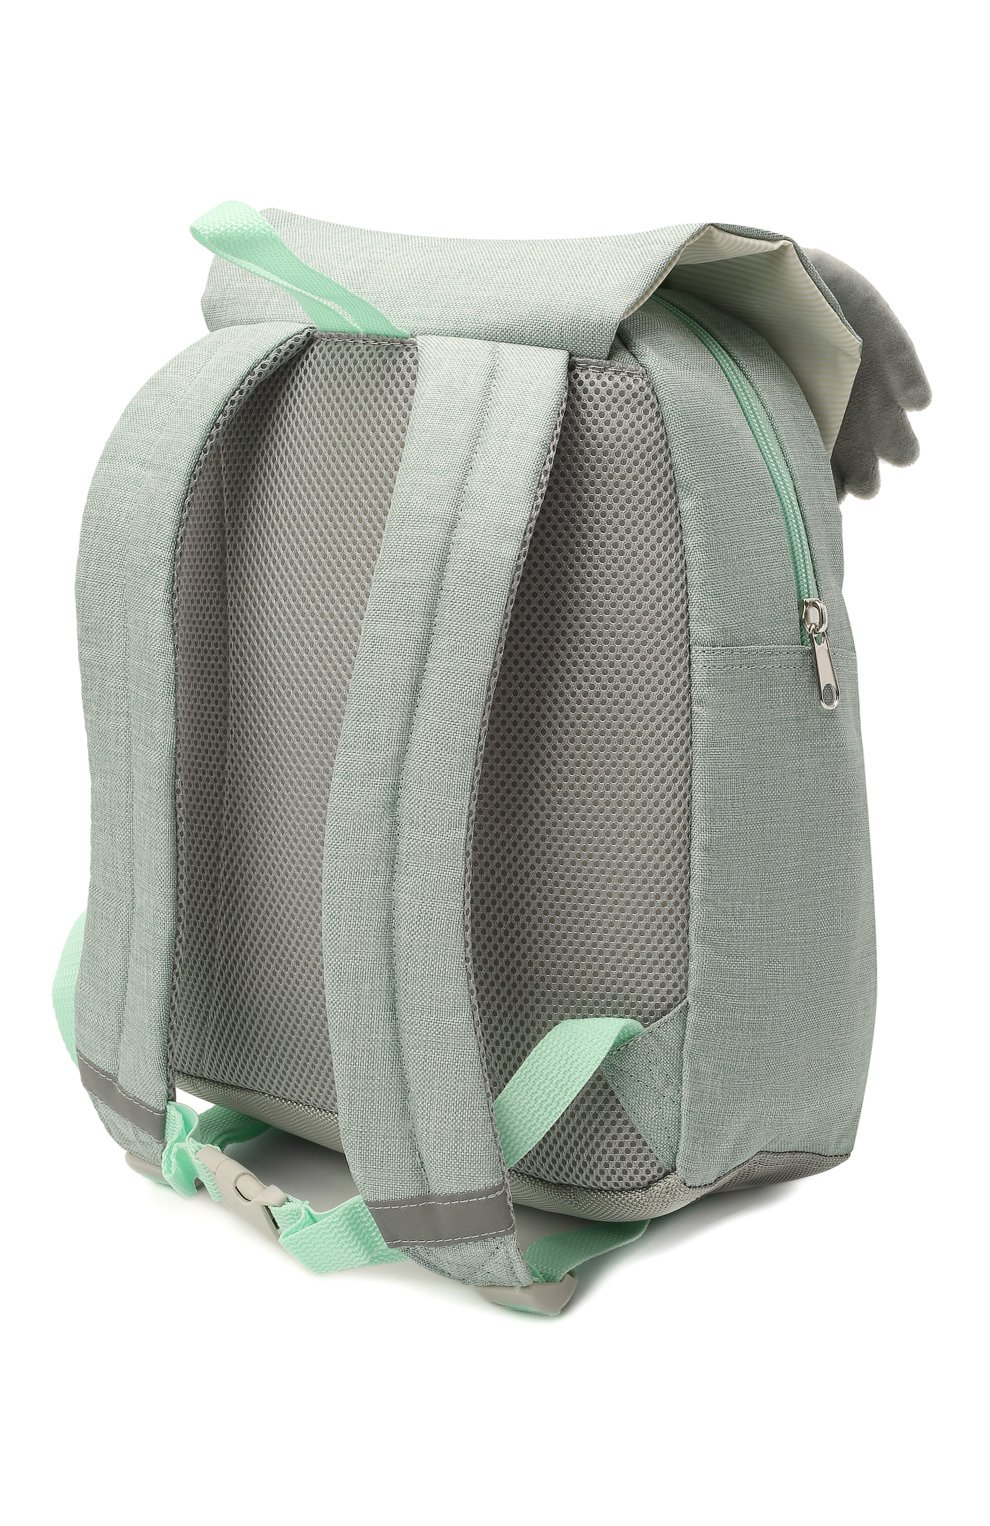 Детская рюкзак happy sammies SAMSONITE светло-зеленого цвета, арт. CD0-14038   Фото 2 (Материал: Текстиль)